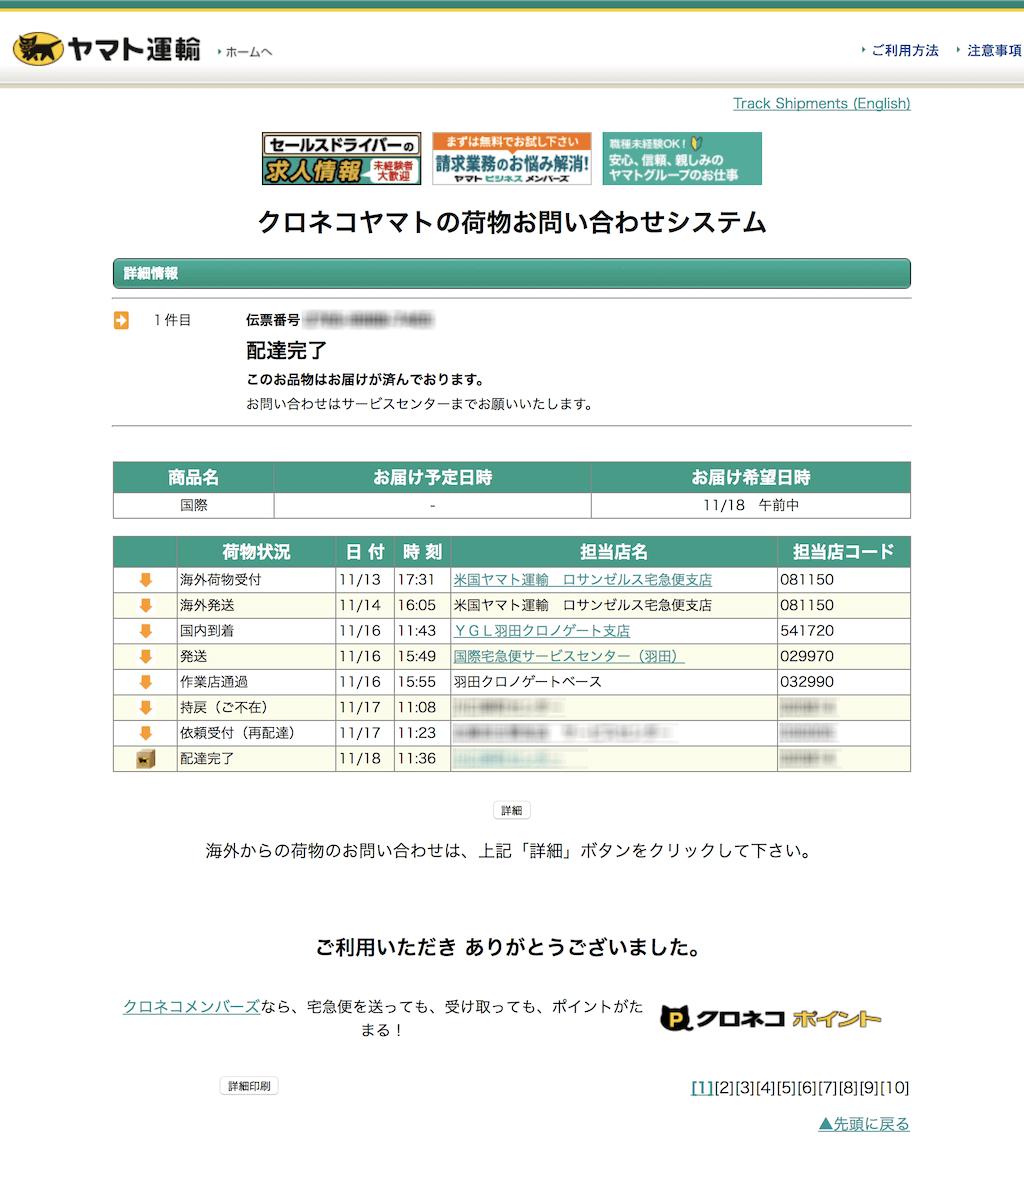 iHerbでお買い物 ヤマト追跡画面